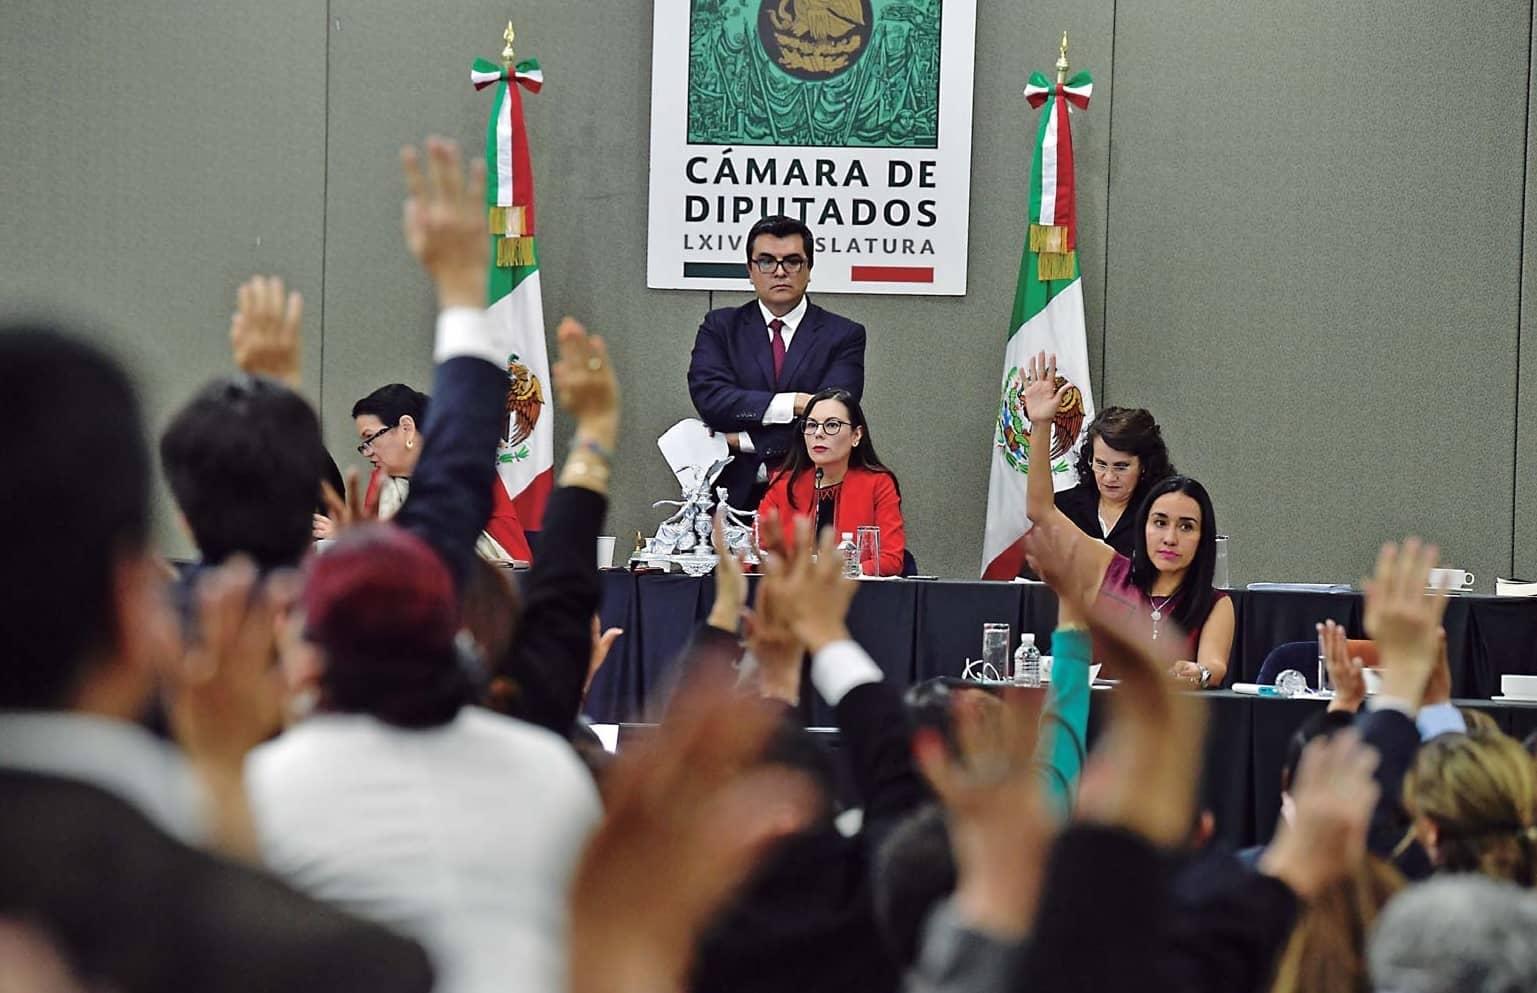 Presupuesto Morena Volvio A Darle Gusto Al Presidente